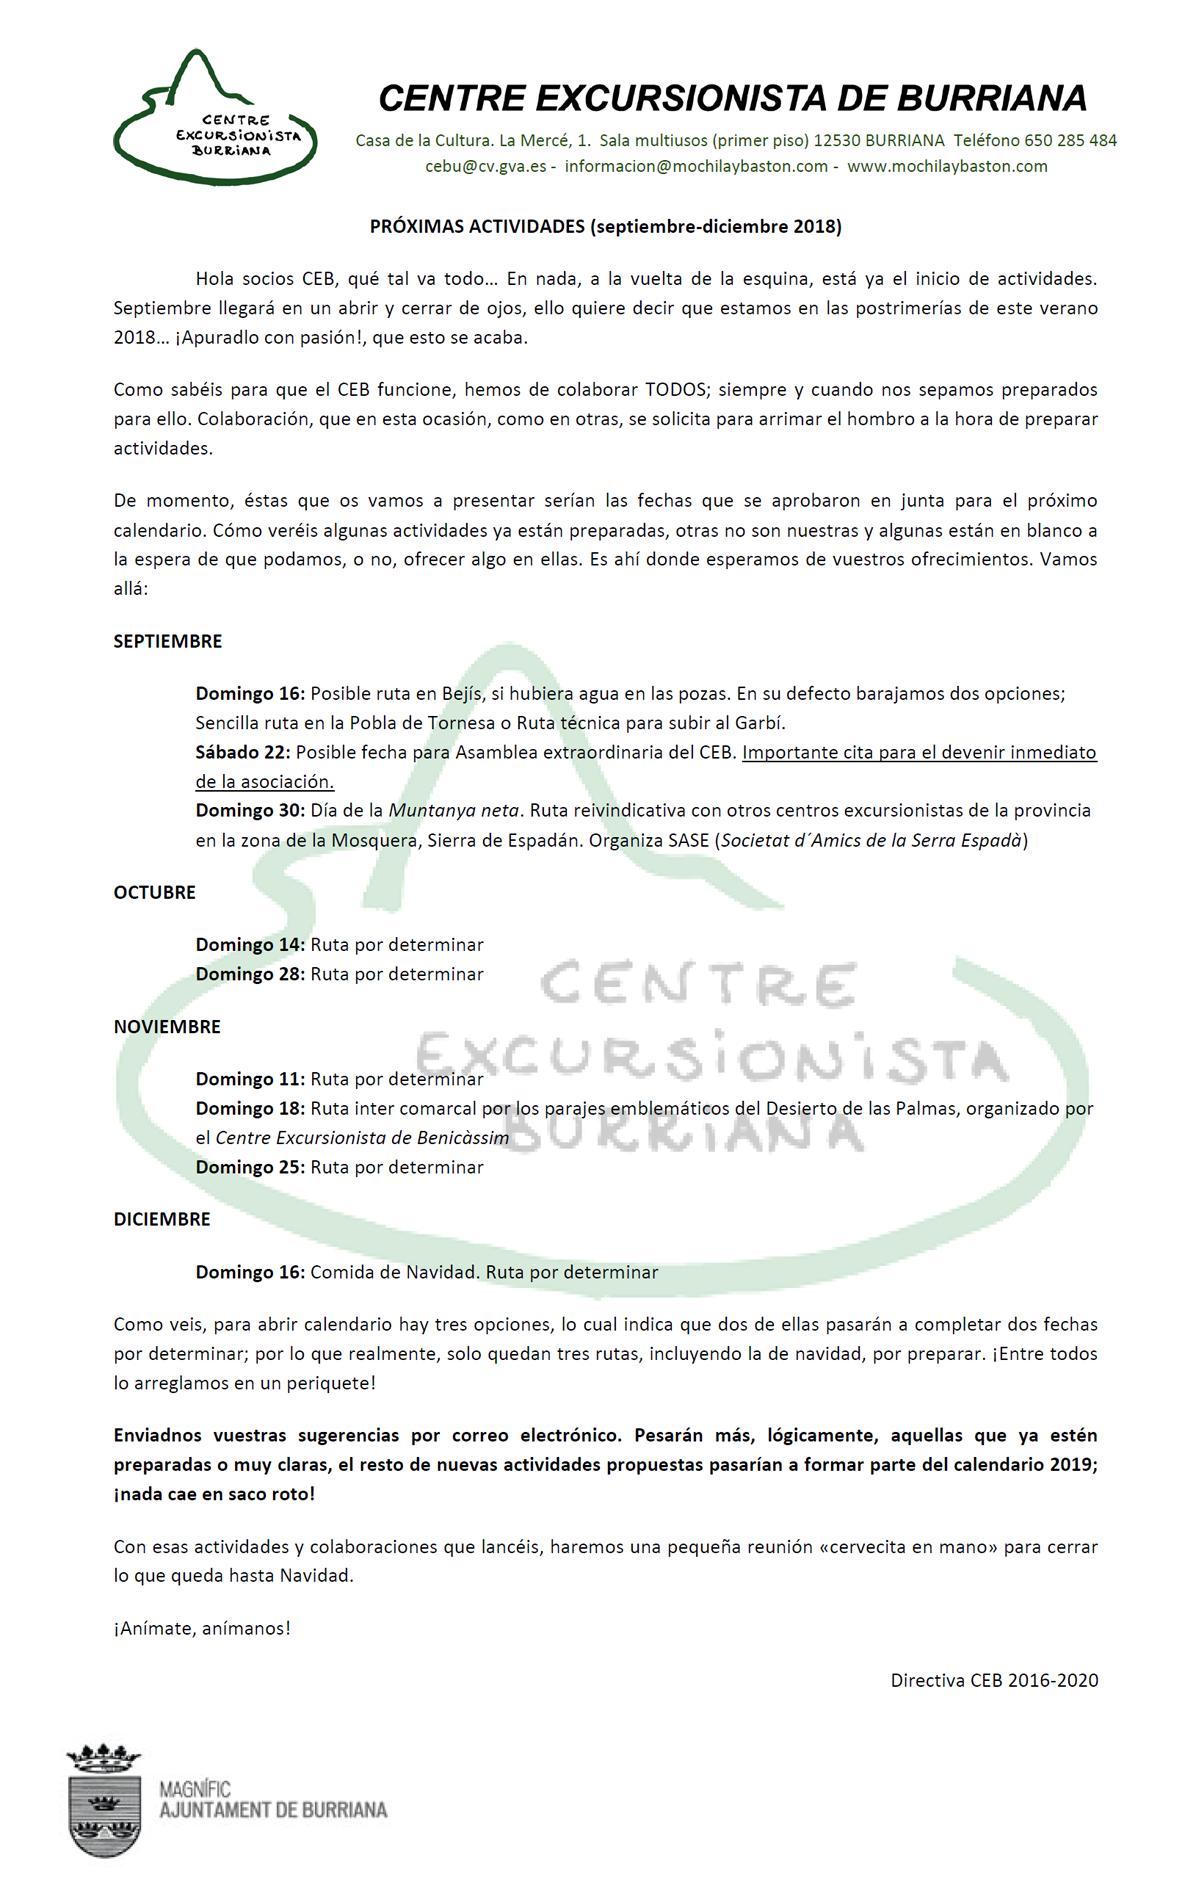 Actividades_cuarto_trimestre_2018